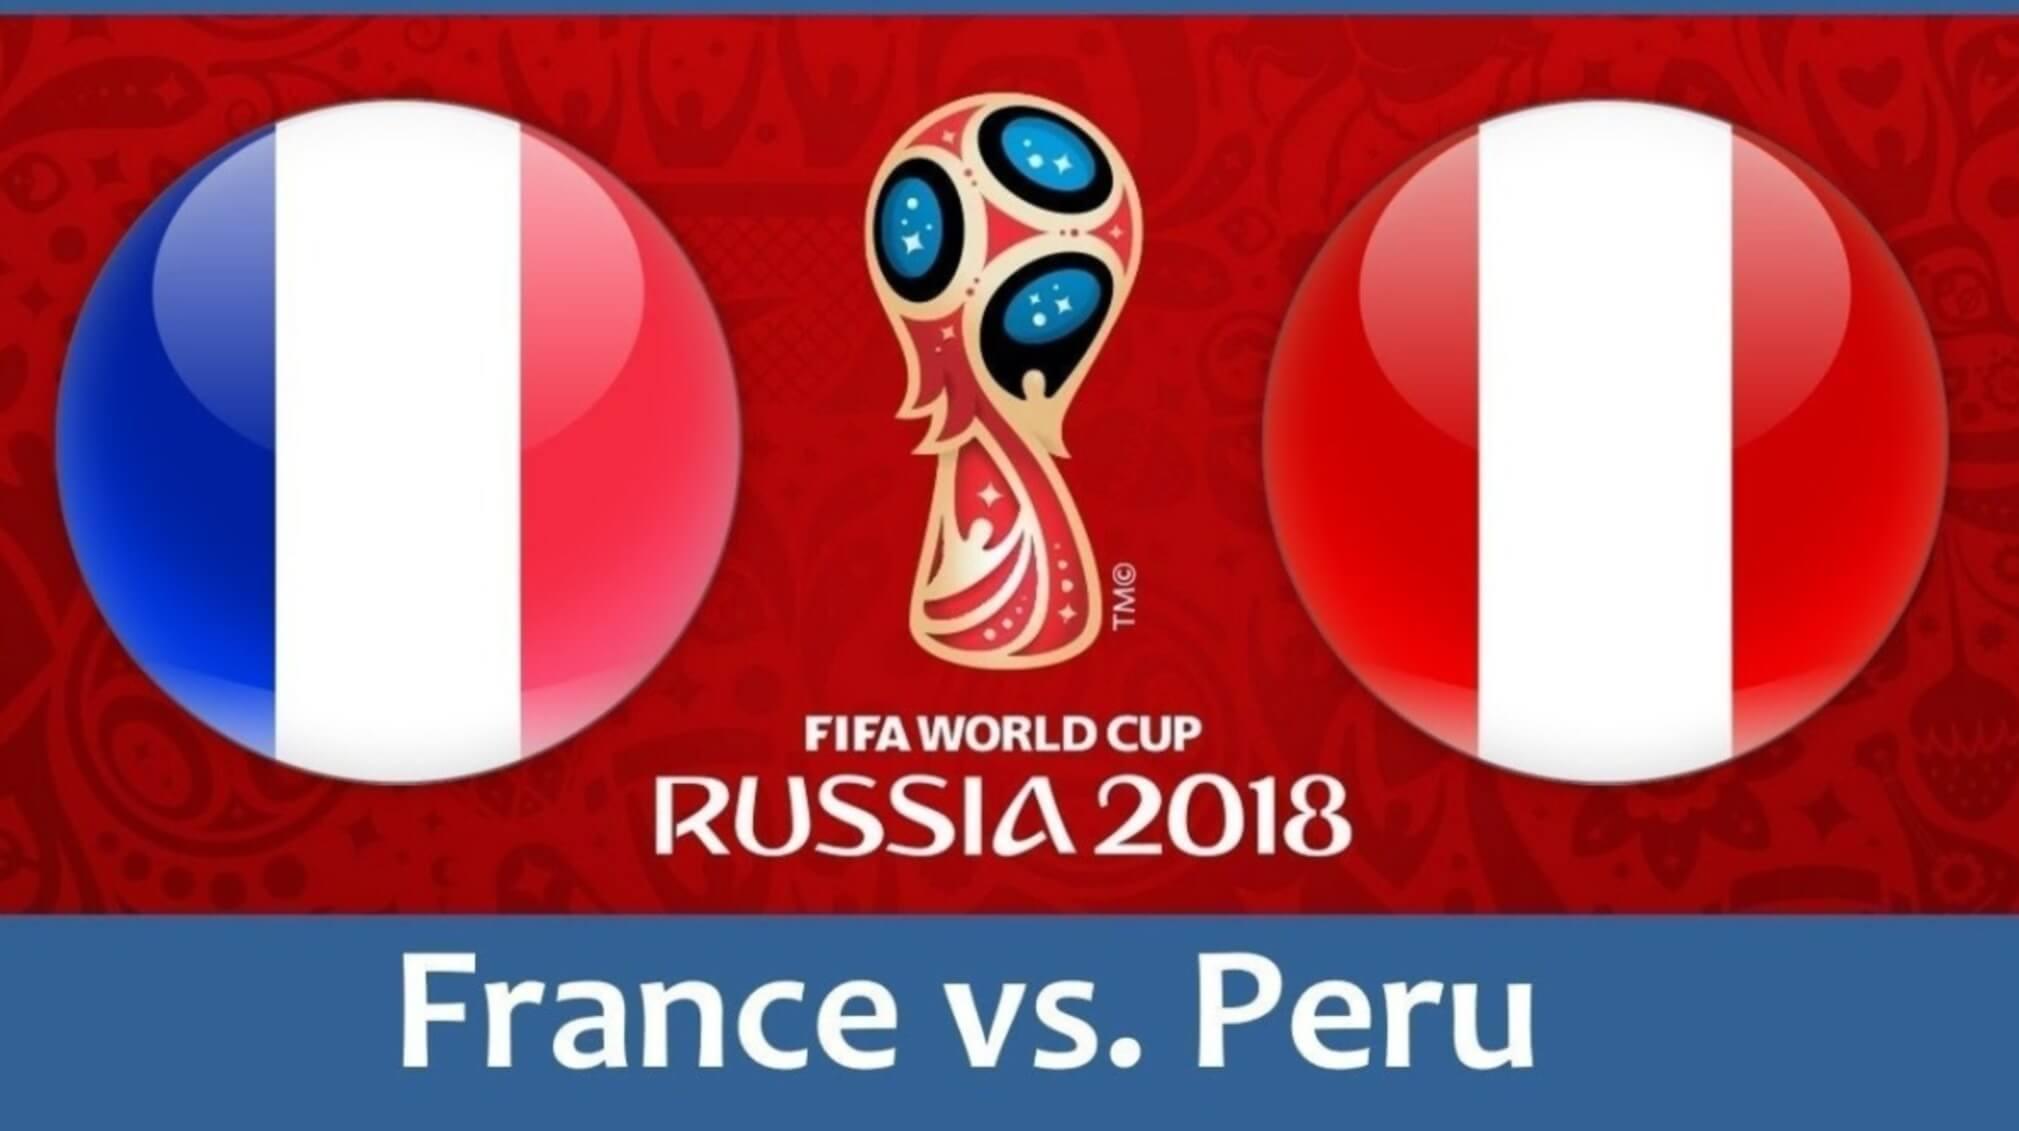 फ्रांस आ पेरुखौ 1-0 आव फेजेन्नो हायो